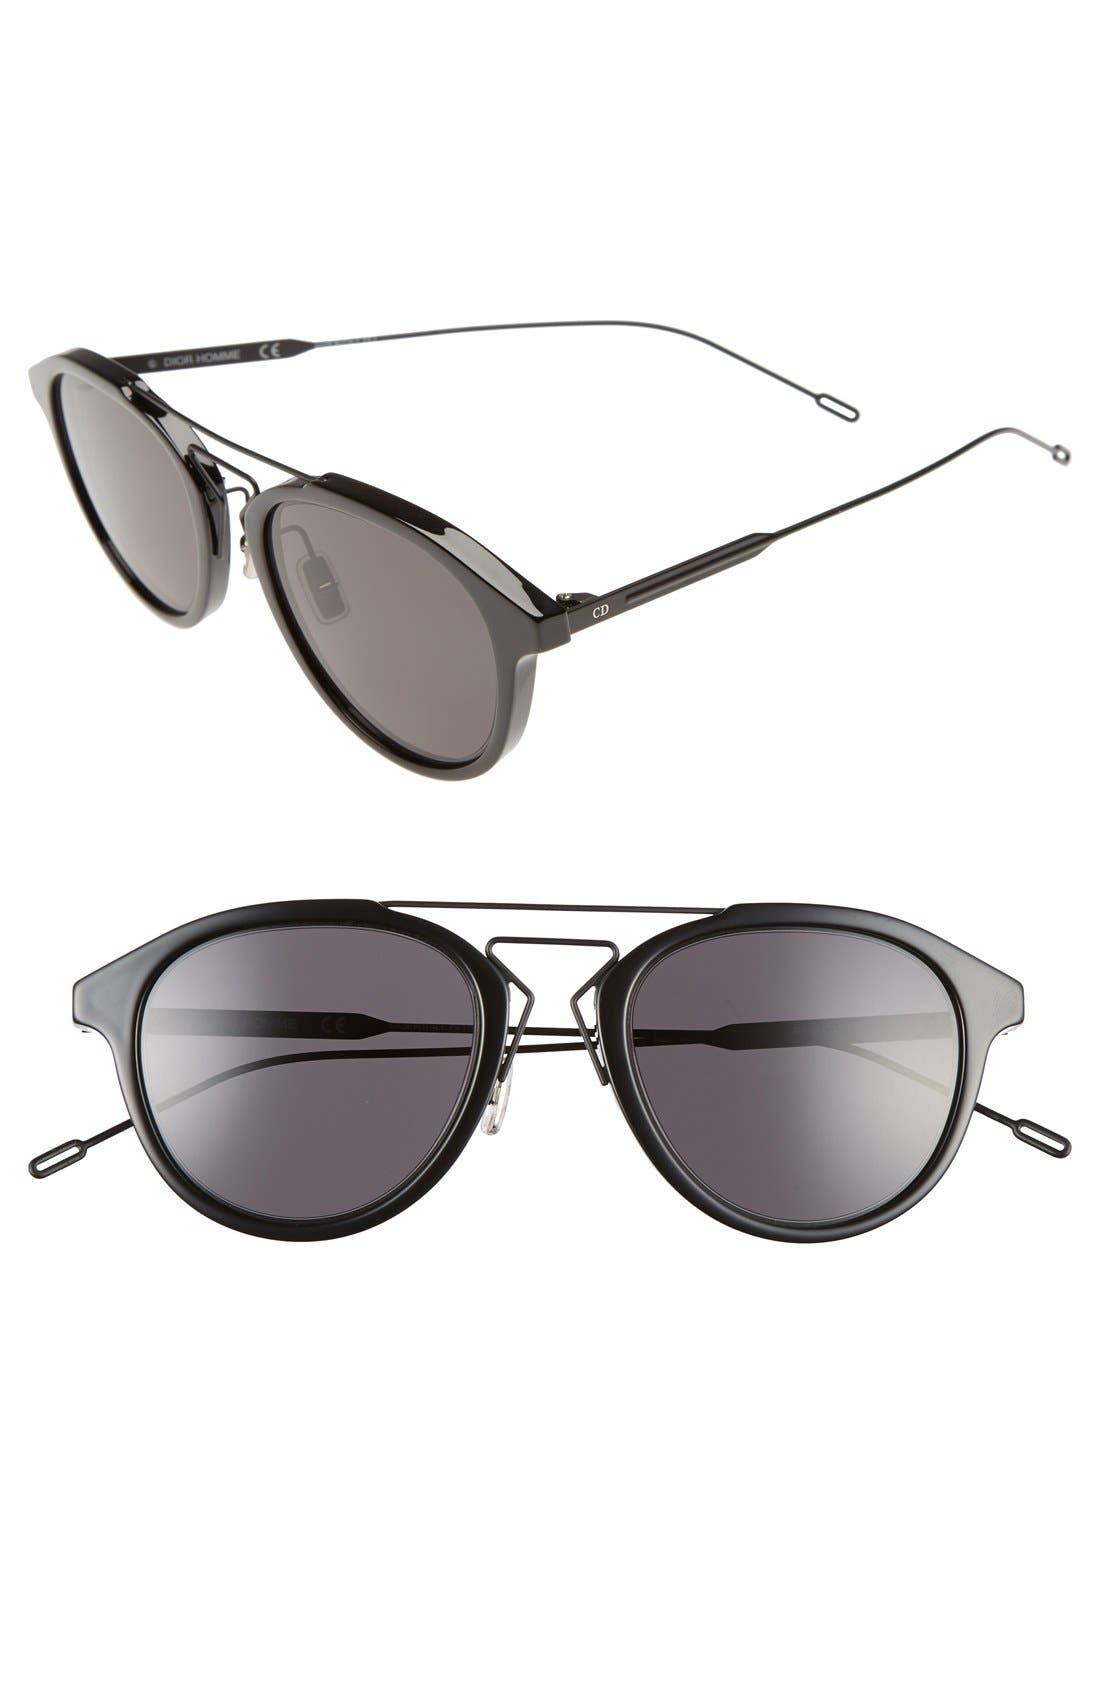 Dior 'Black Tie' 51mm Sunglasses,                         Main,                         color, 001